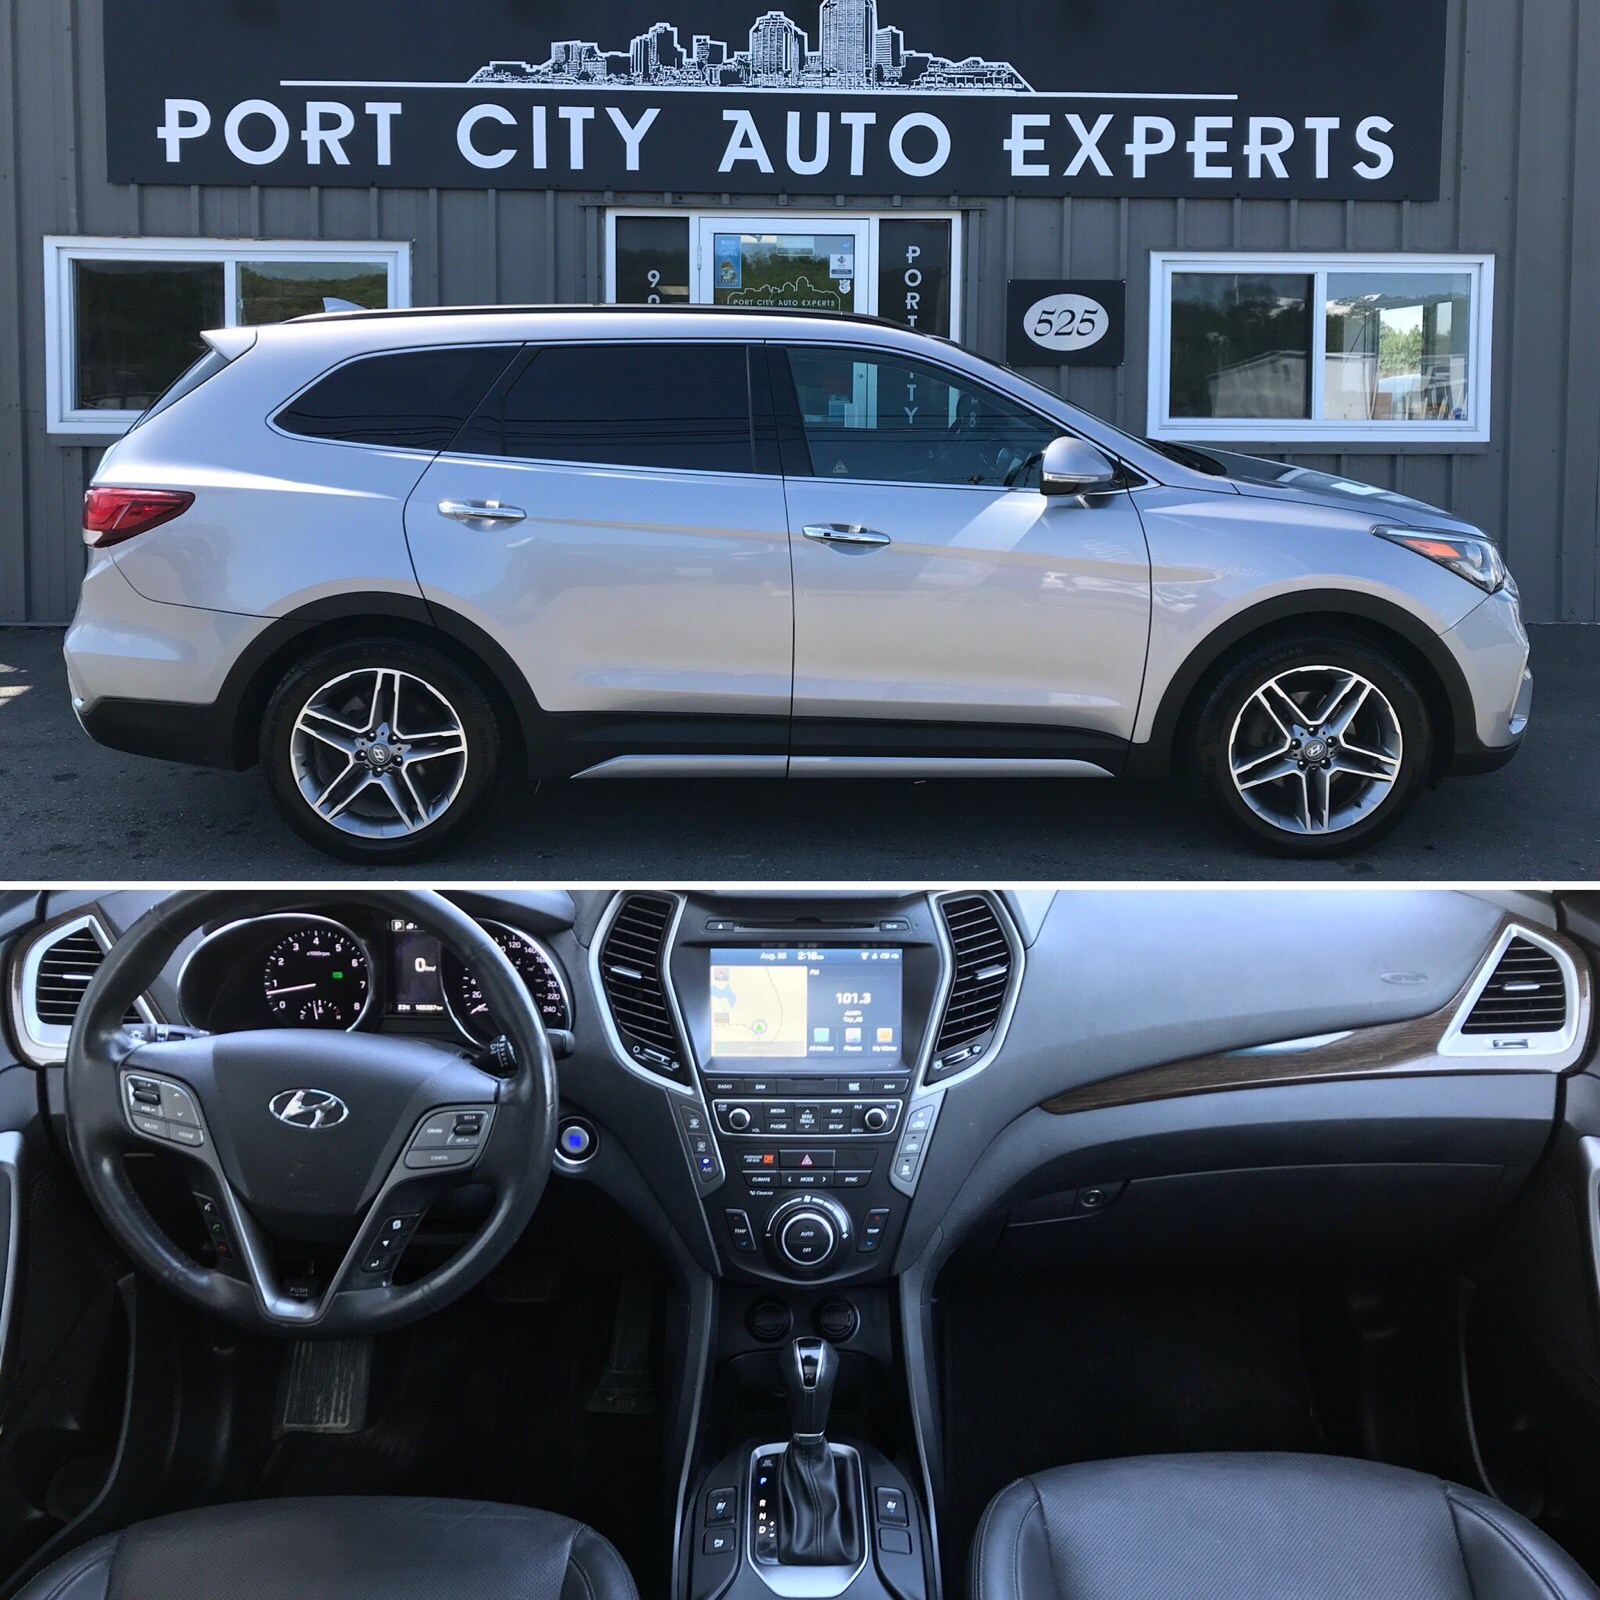 Used 2017 Hyundai Santa Fe Xl For Sale At Port City Auto Experts Vin Km8sndhf7hu187232